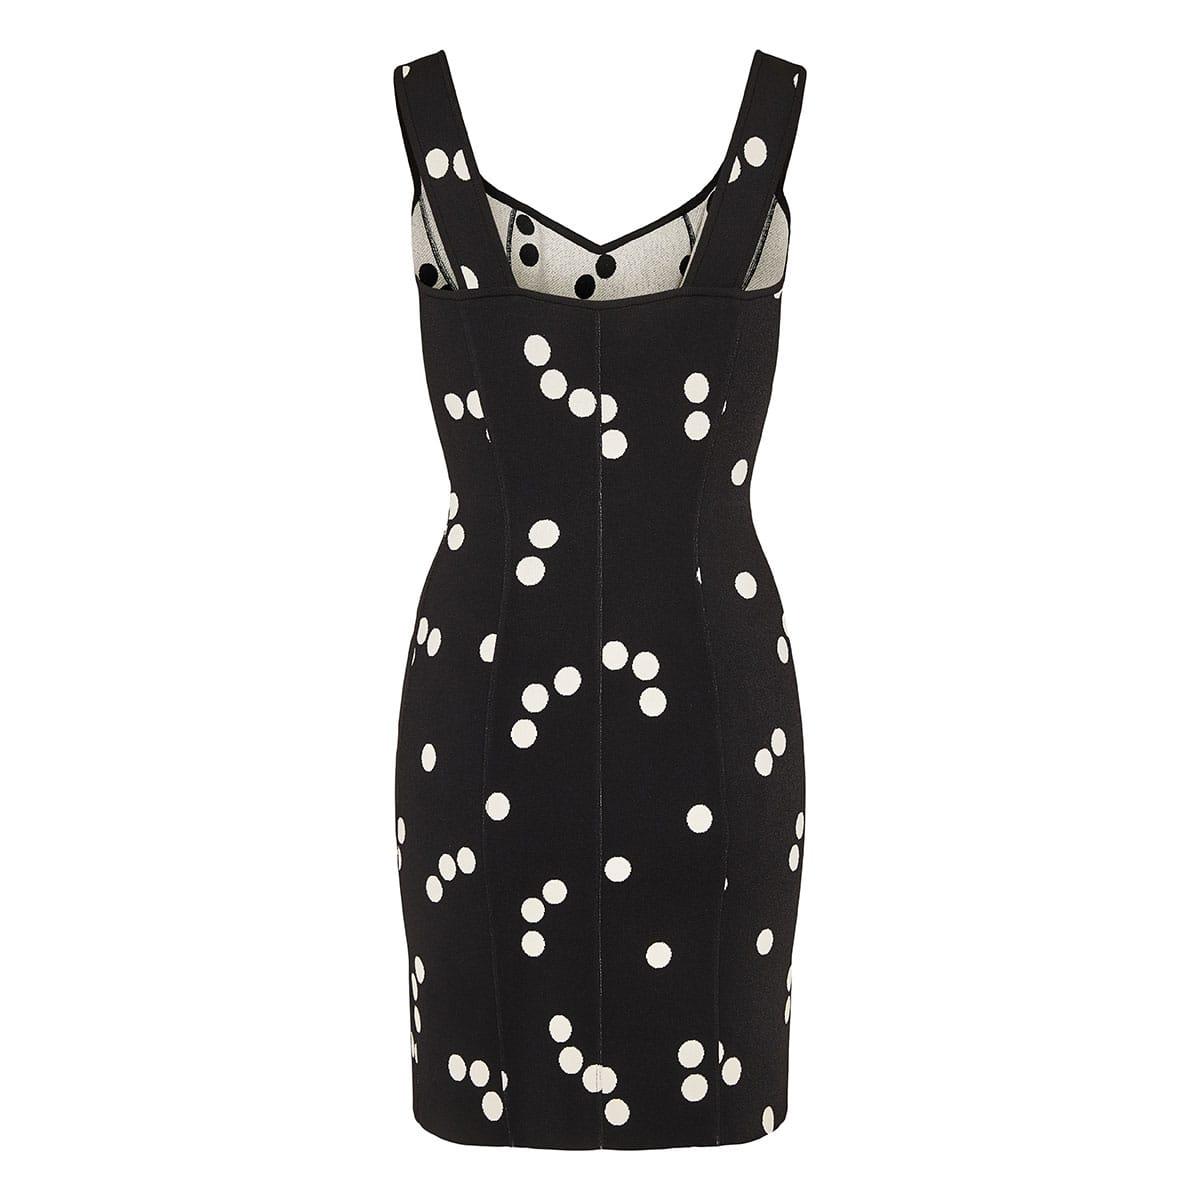 Edition 1991 polka-dot mini dress